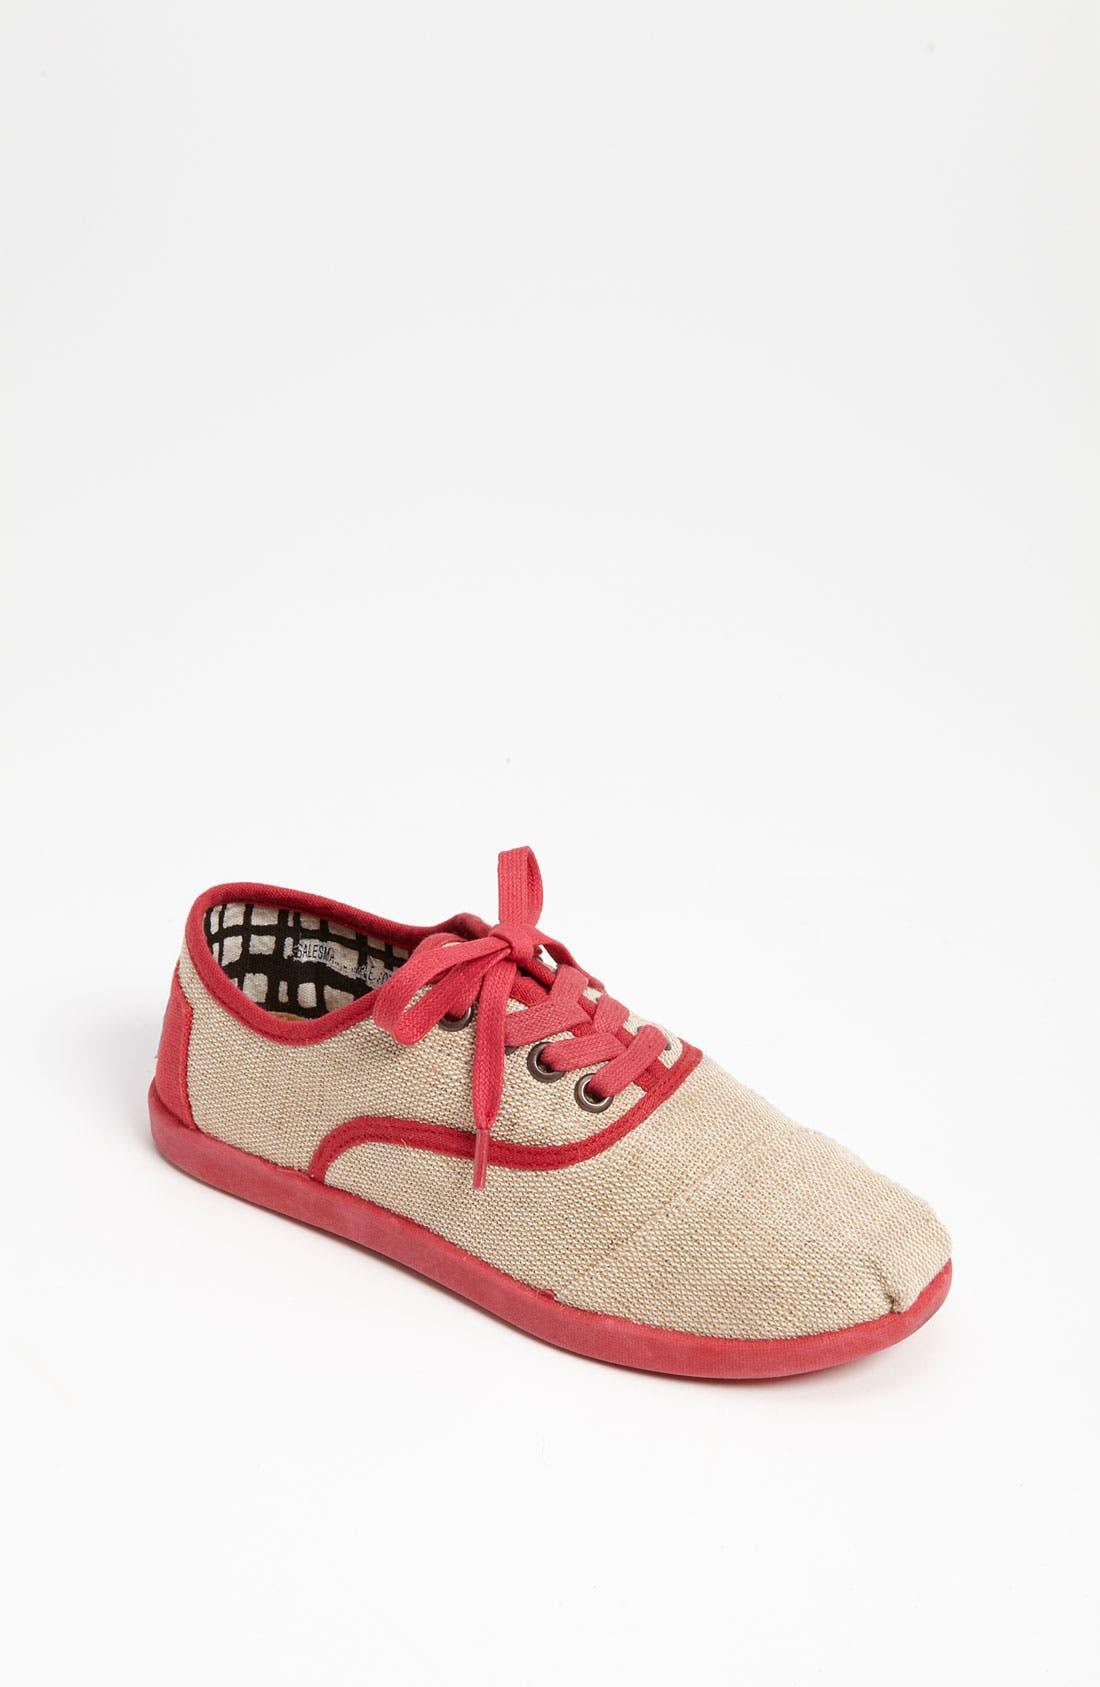 Main Image - TOMS 'Cordones Youth - Maddox' Burlap Sneaker (Toddler, Little Kid & Big Kid)